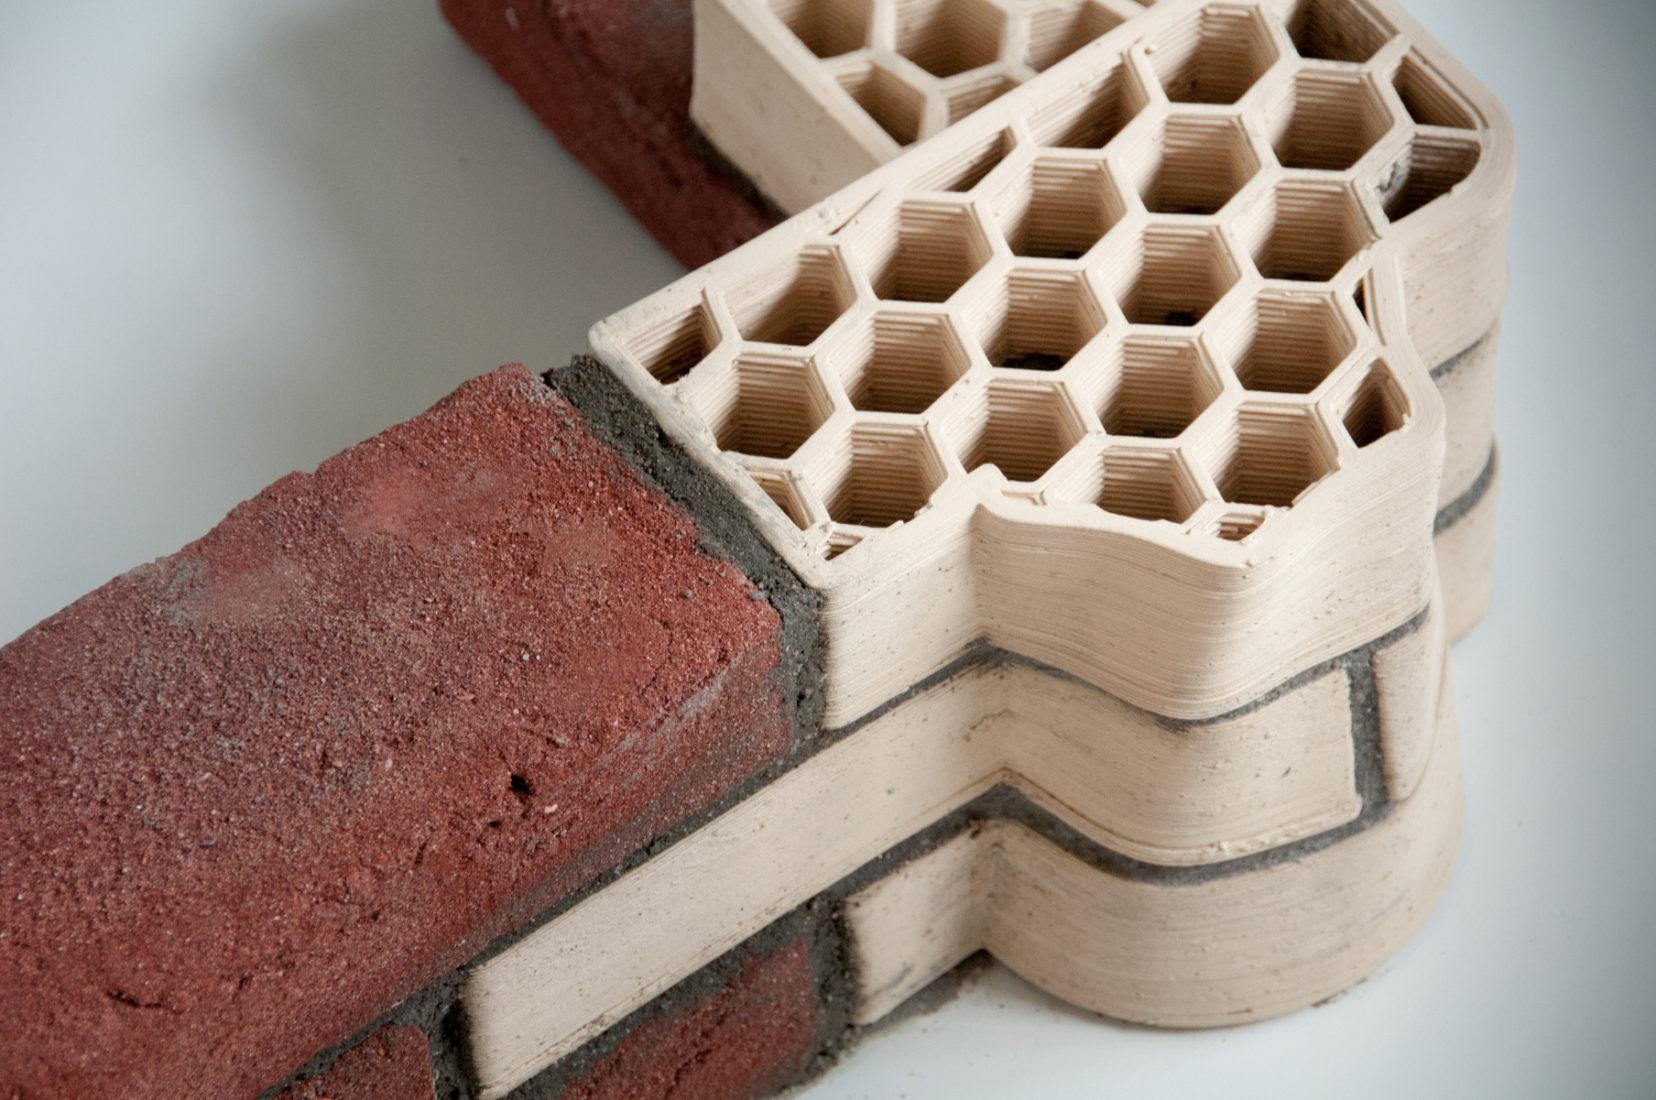 Individuell gedruckte Unipor-Mauerziegel aus tonartigem Lehm. Foto: Dennis de Witte, TU Darmstadt